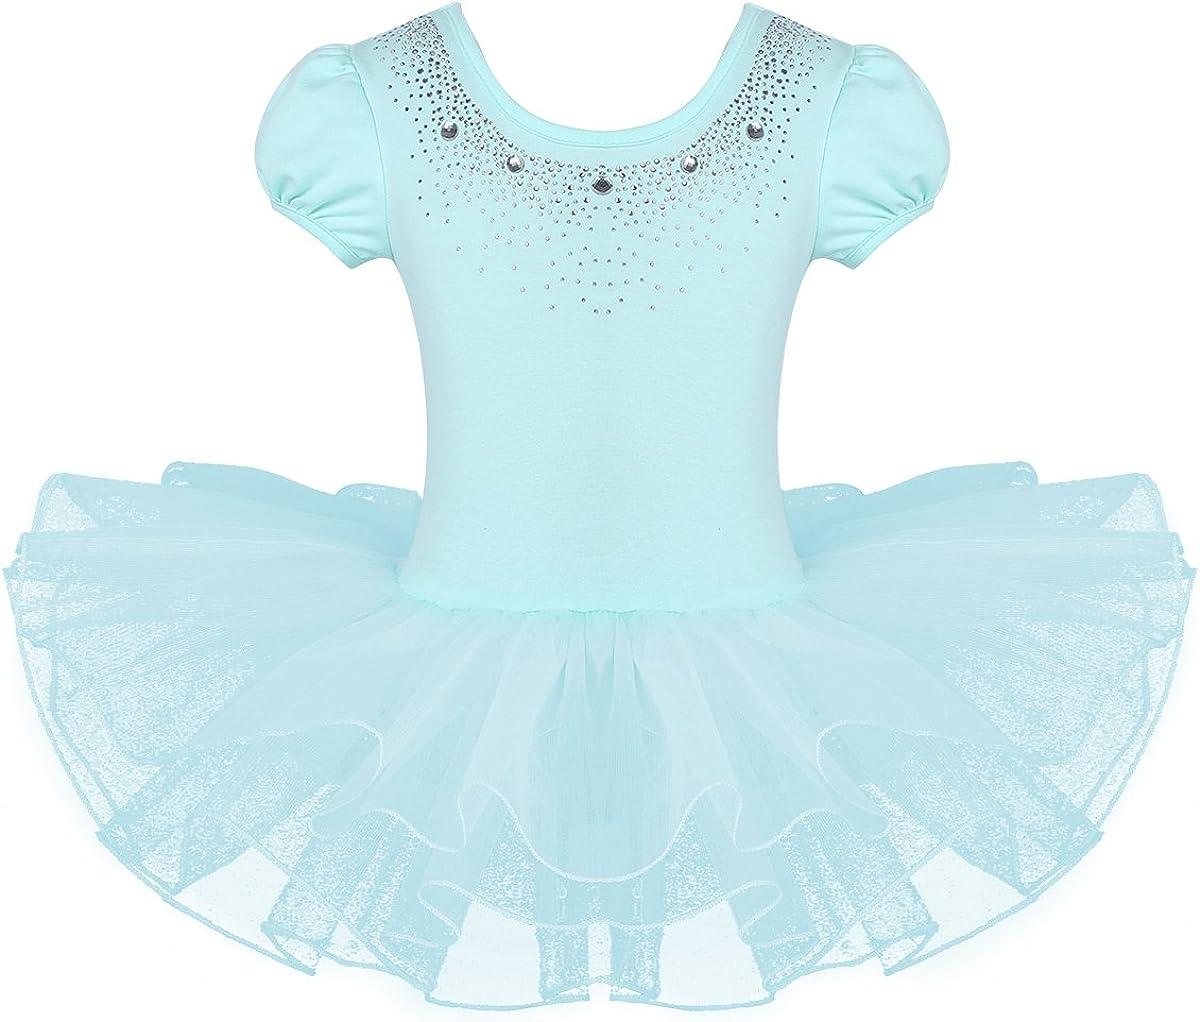 QinCiao Short Sleeve Rhinestone Indefinitely Ballet Tutu Dress Toddler Ki for Popular brand